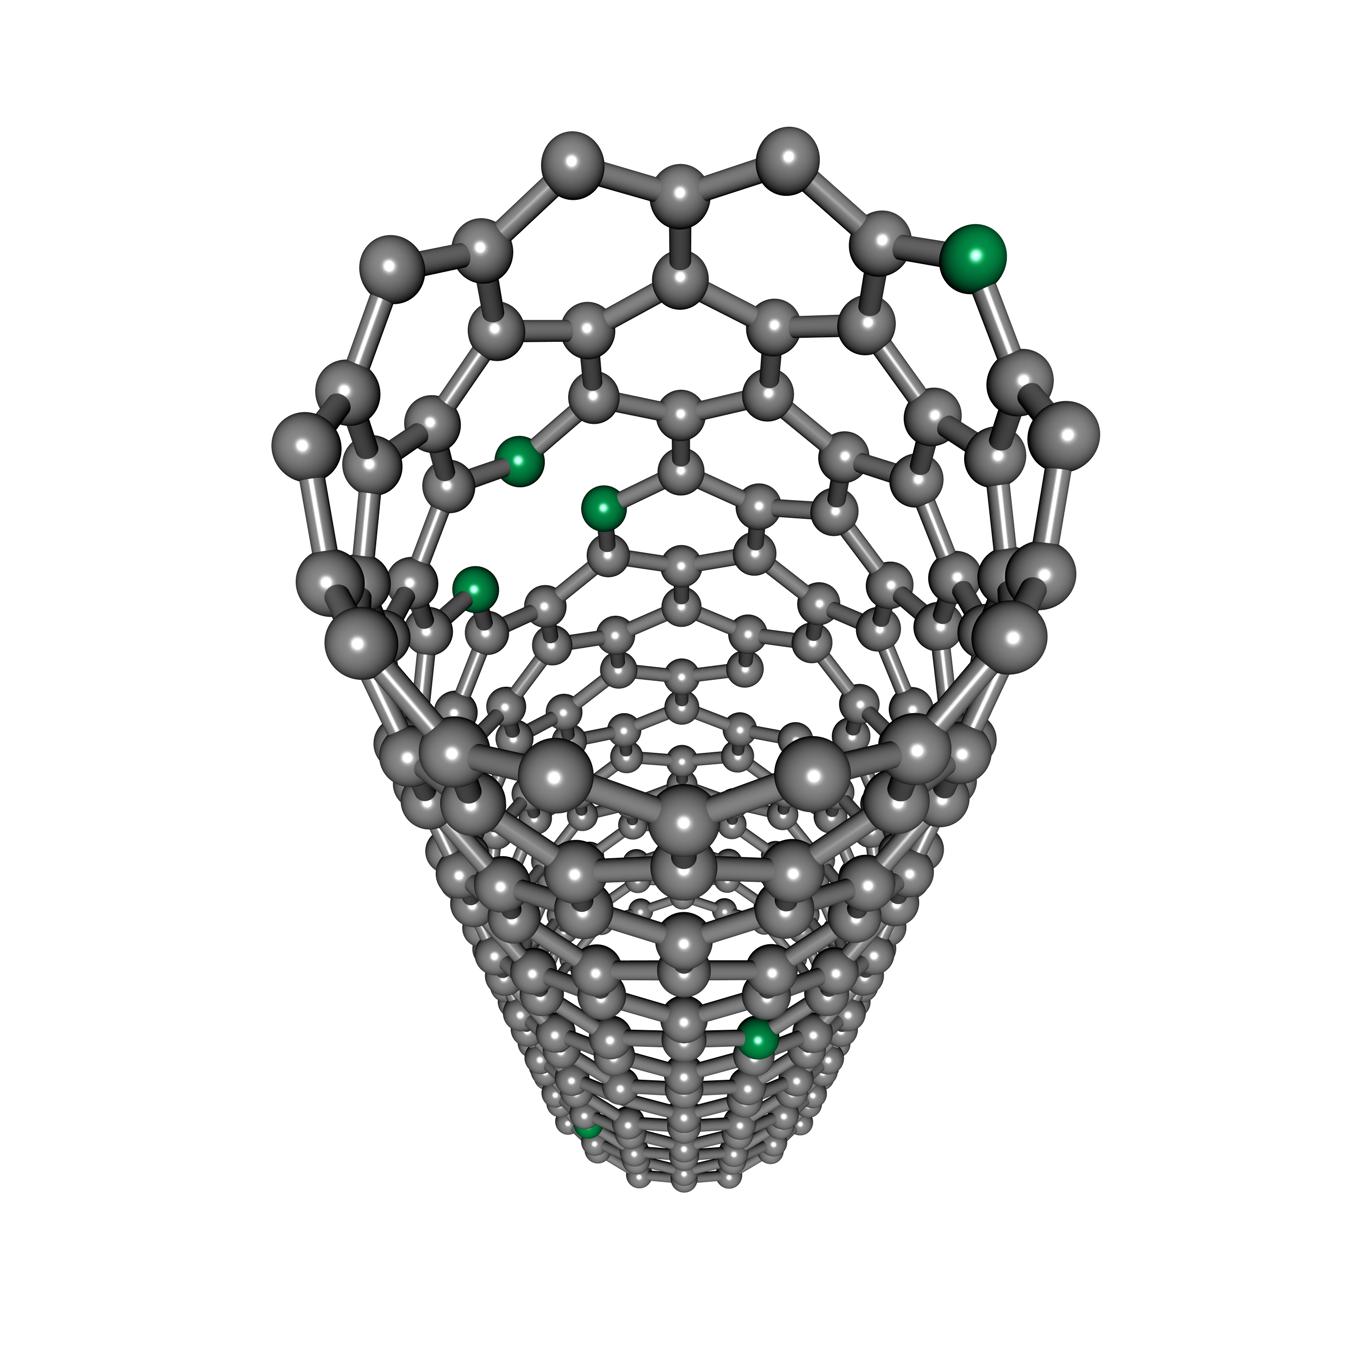 Doping nanomaterials with heteroatoms